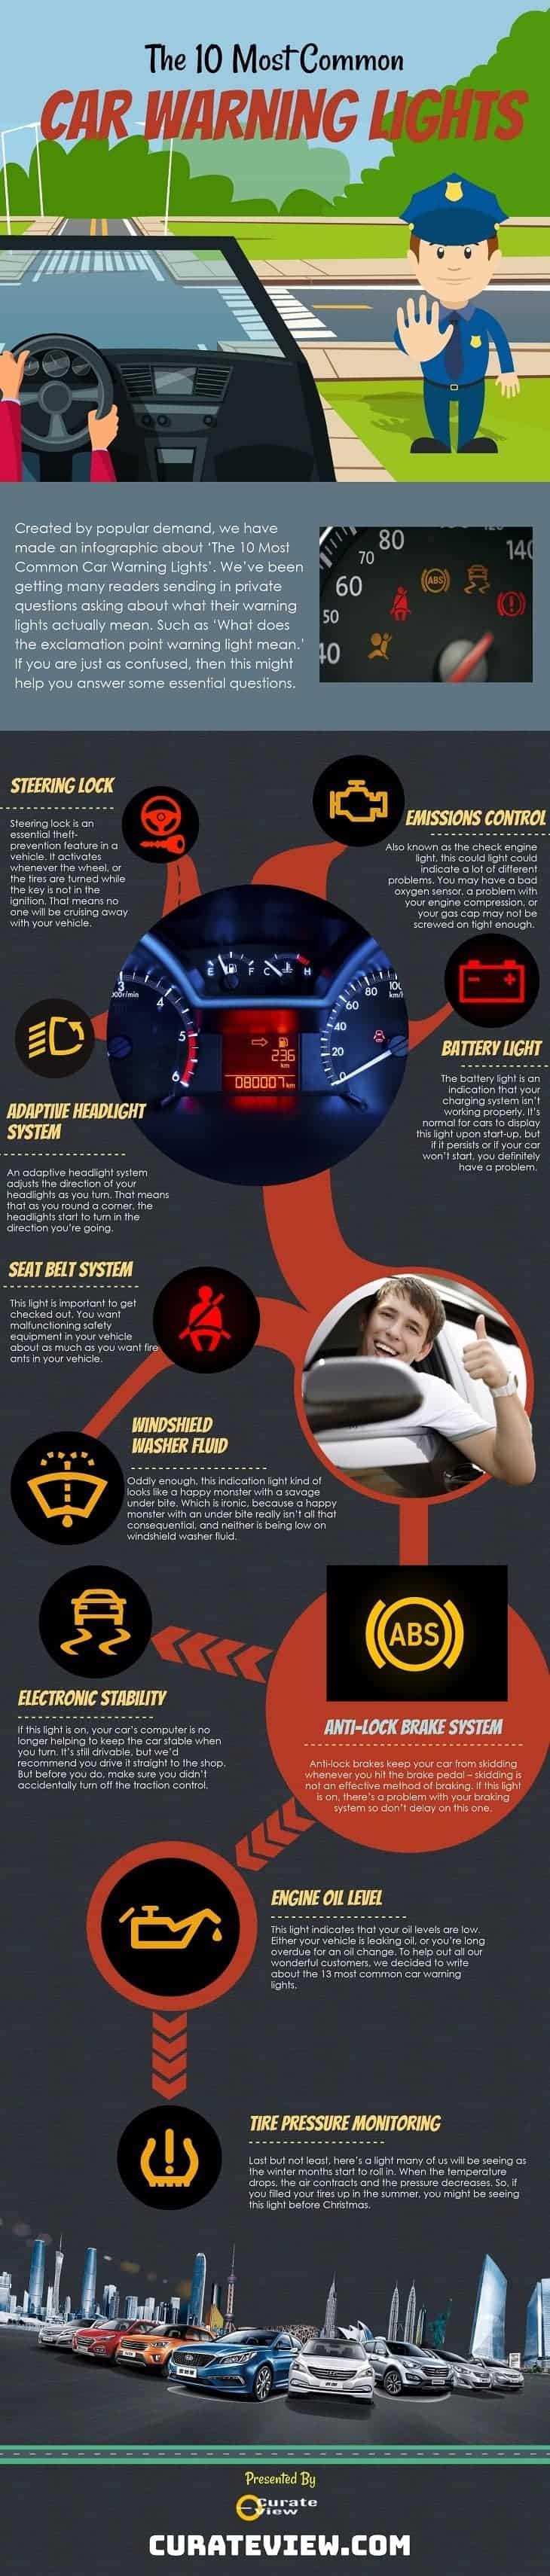 10 Most Common Car Warning Lights